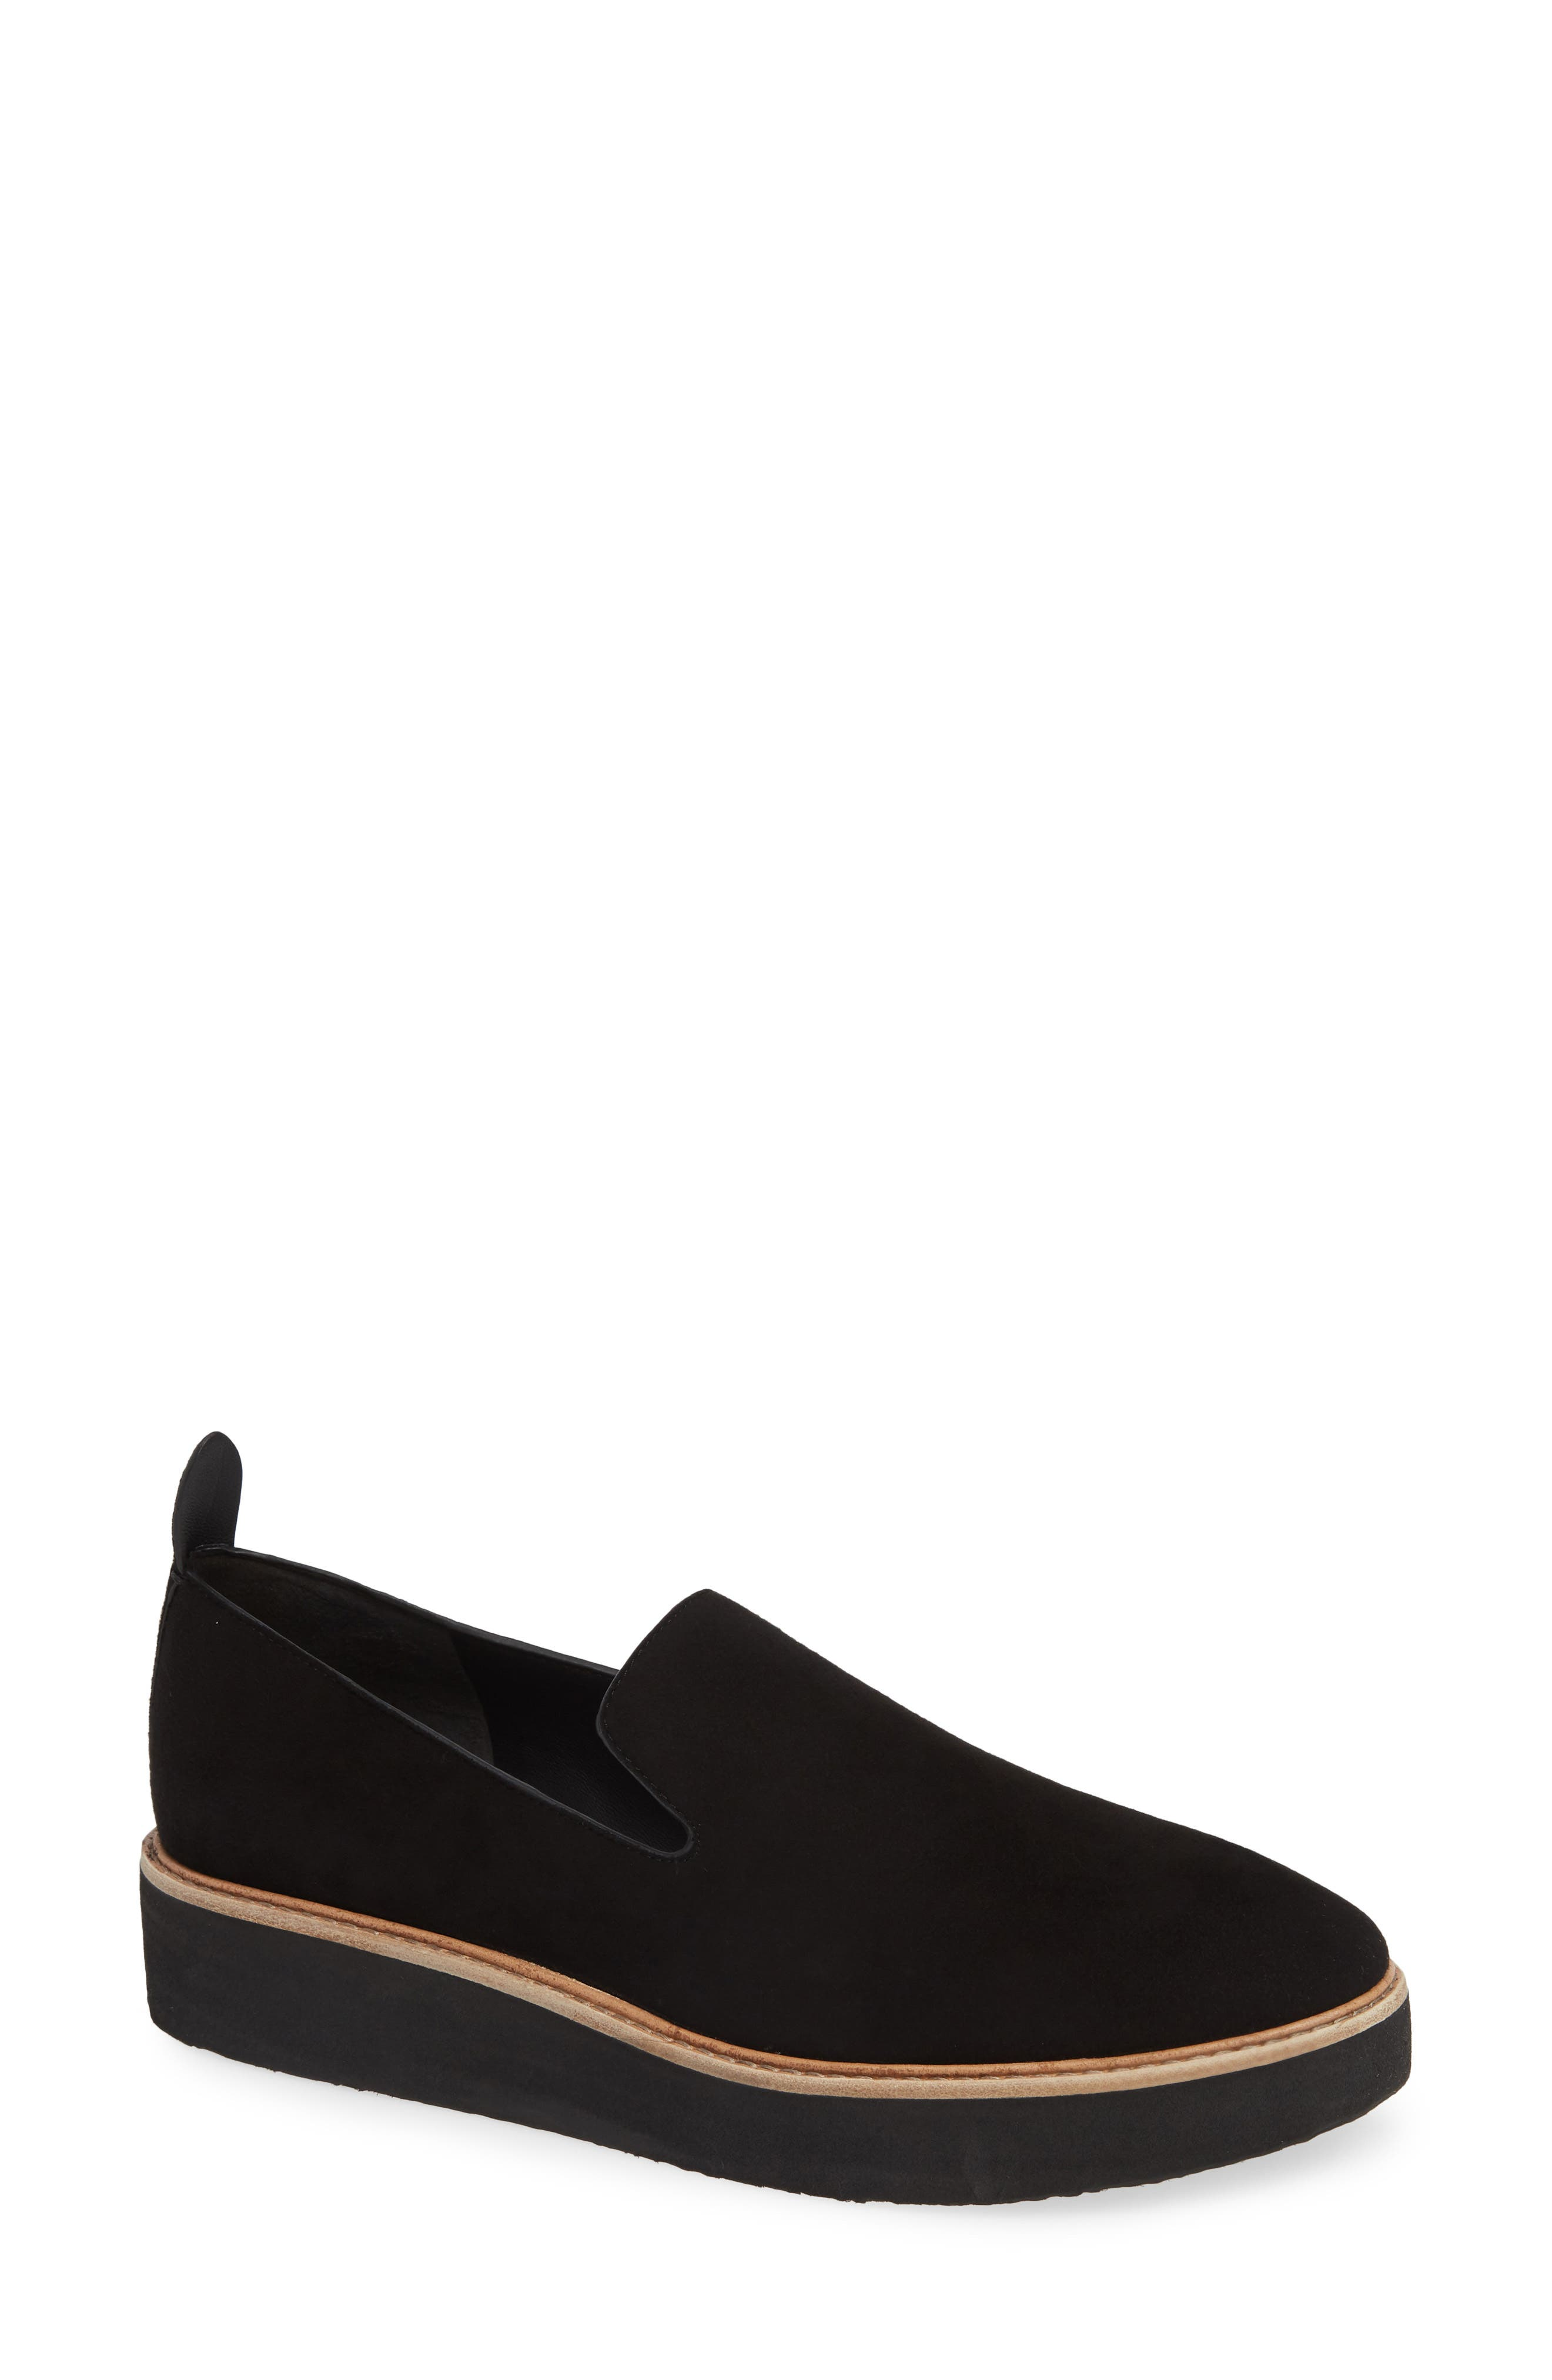 Sanders Slip-On Sneaker,                             Main thumbnail 1, color,                             BLACK/ BLACK LEATHER